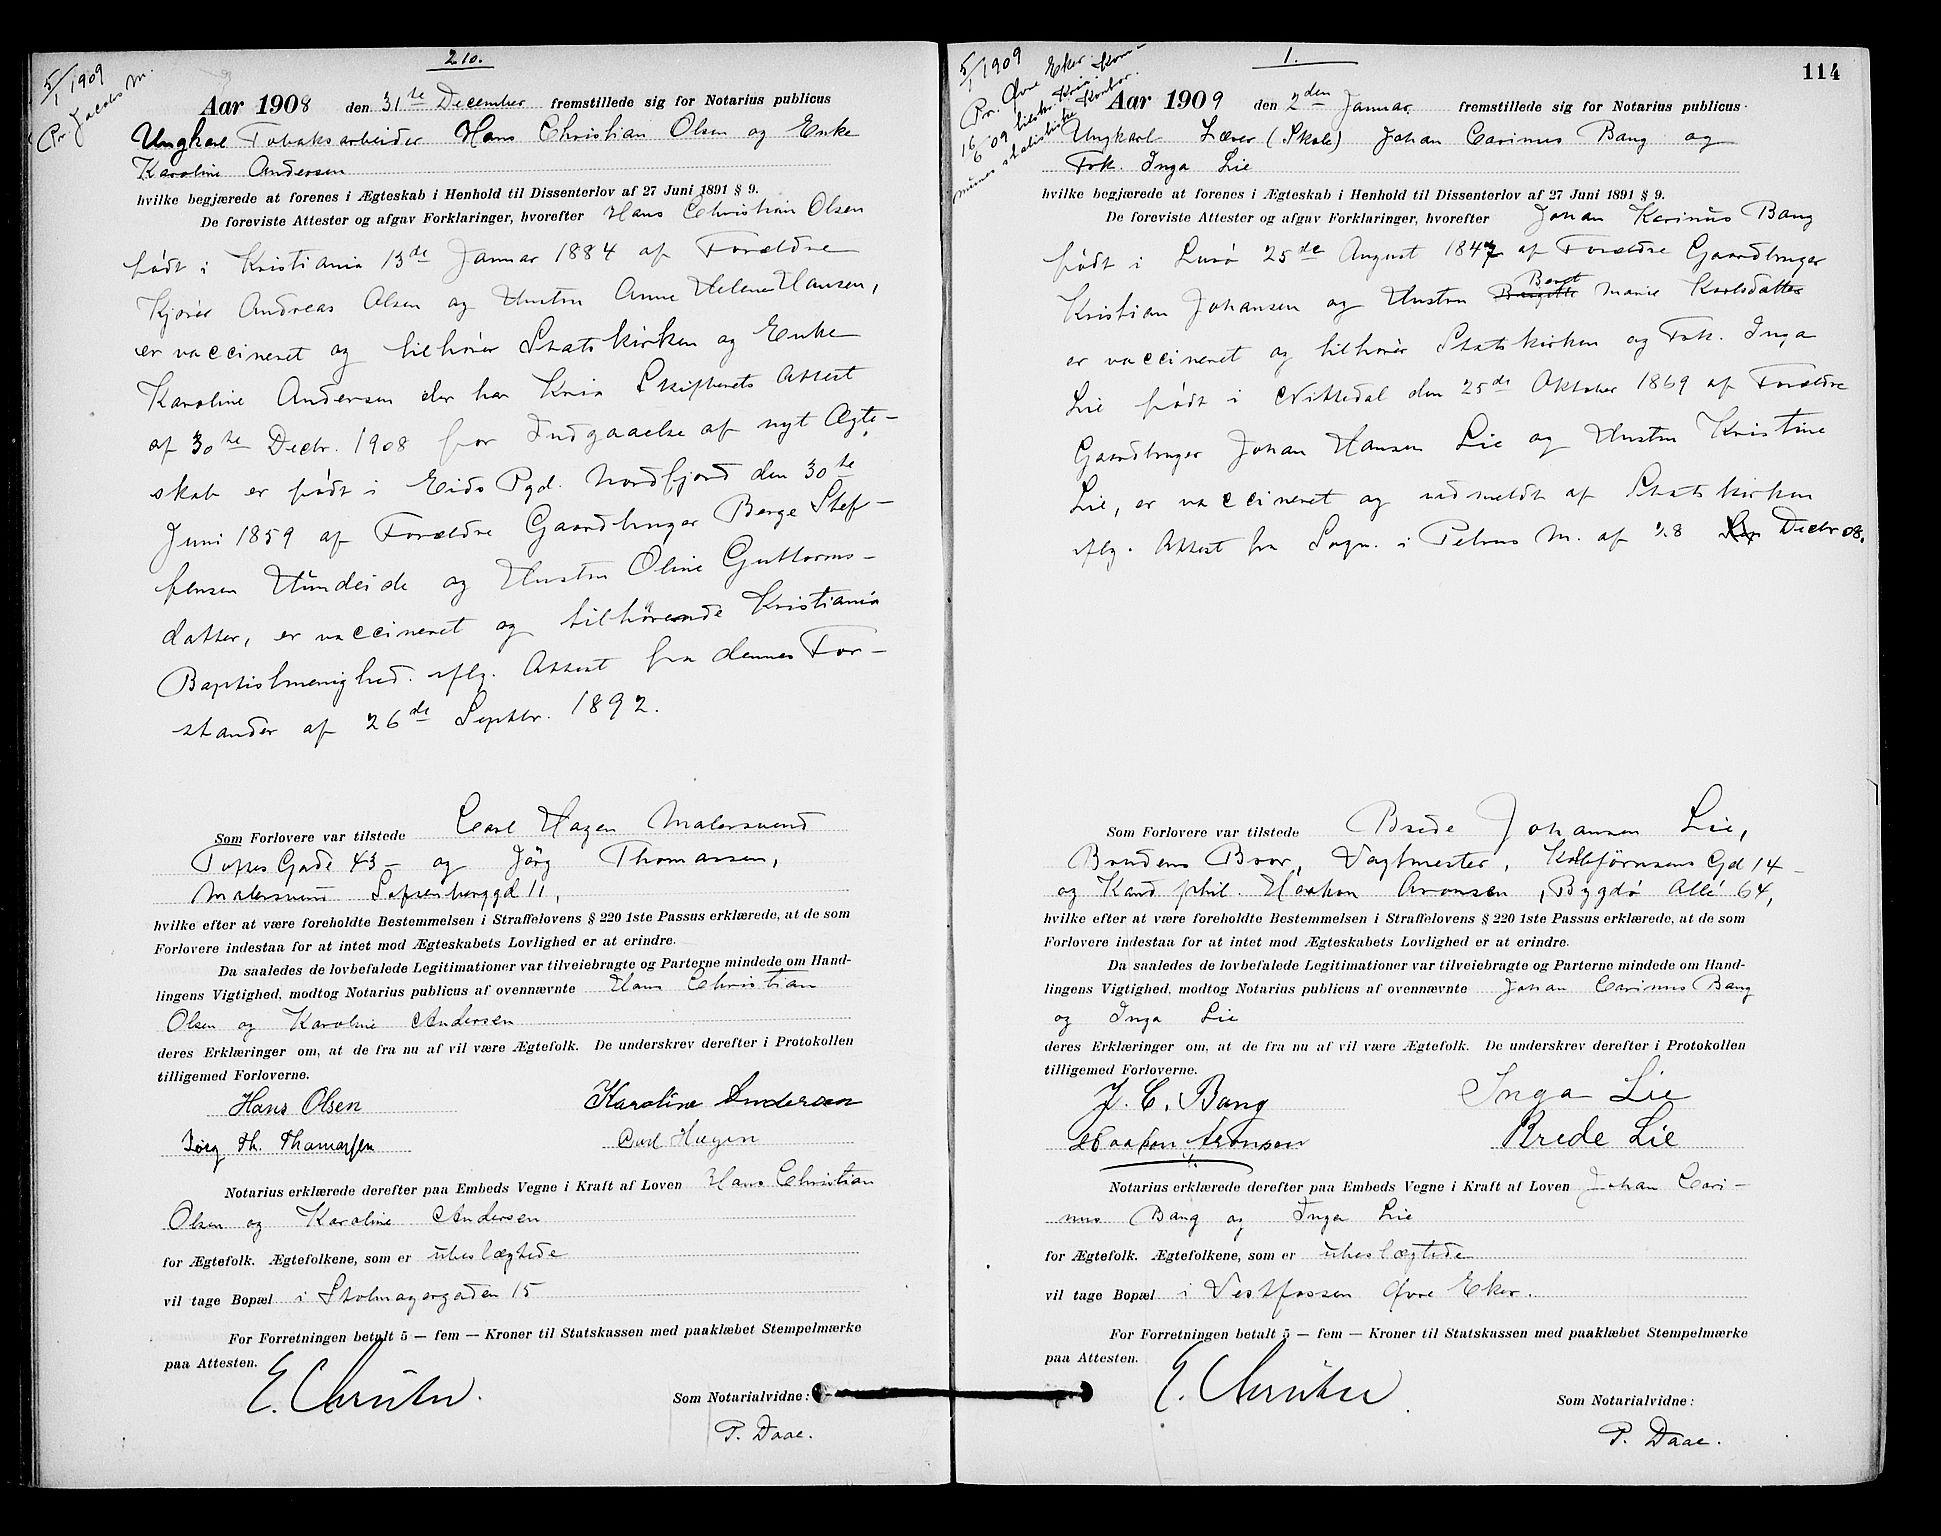 SAO, Oslo byfogd avd. I, L/Lb/Lbb/L0007: Notarialprotokoll, rekke II: Vigsler, 1907-1911, s. 113b-114a